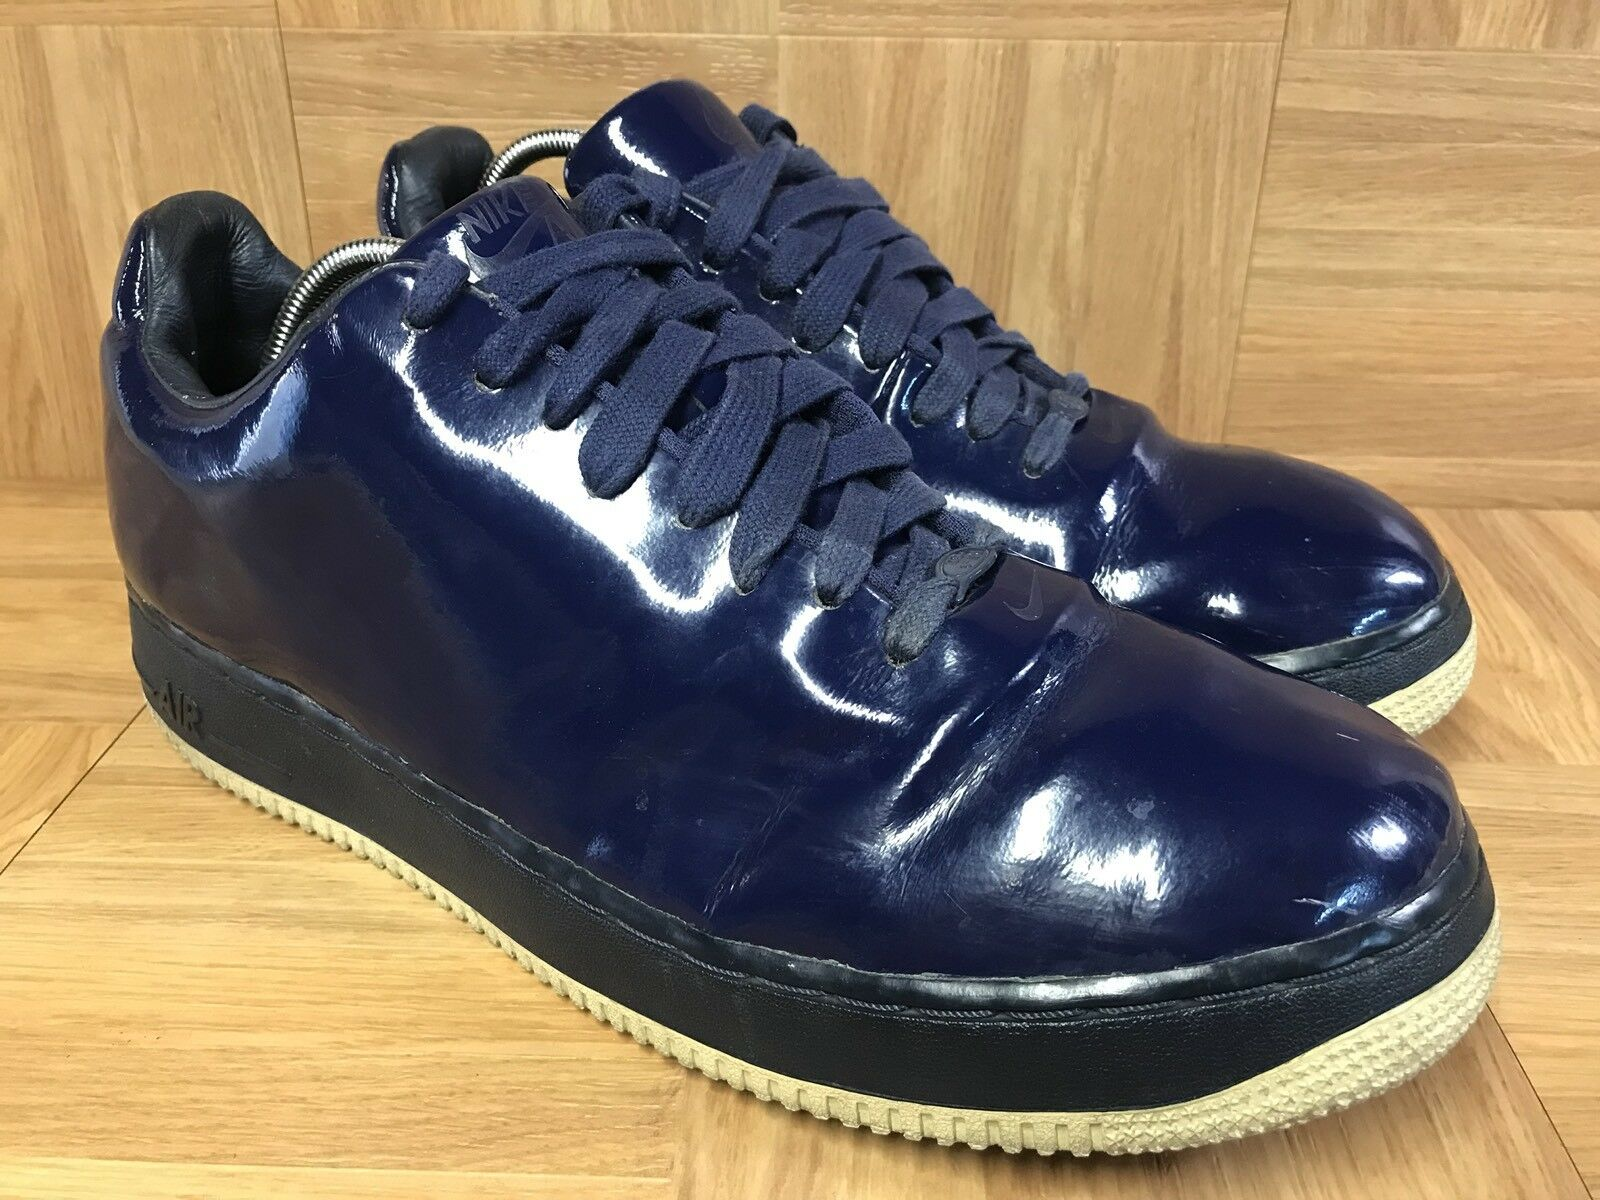 getragen � obsidian nike air force 1 obsidian � blaue lackleder glänzende 12 313644-411 bball - 617059